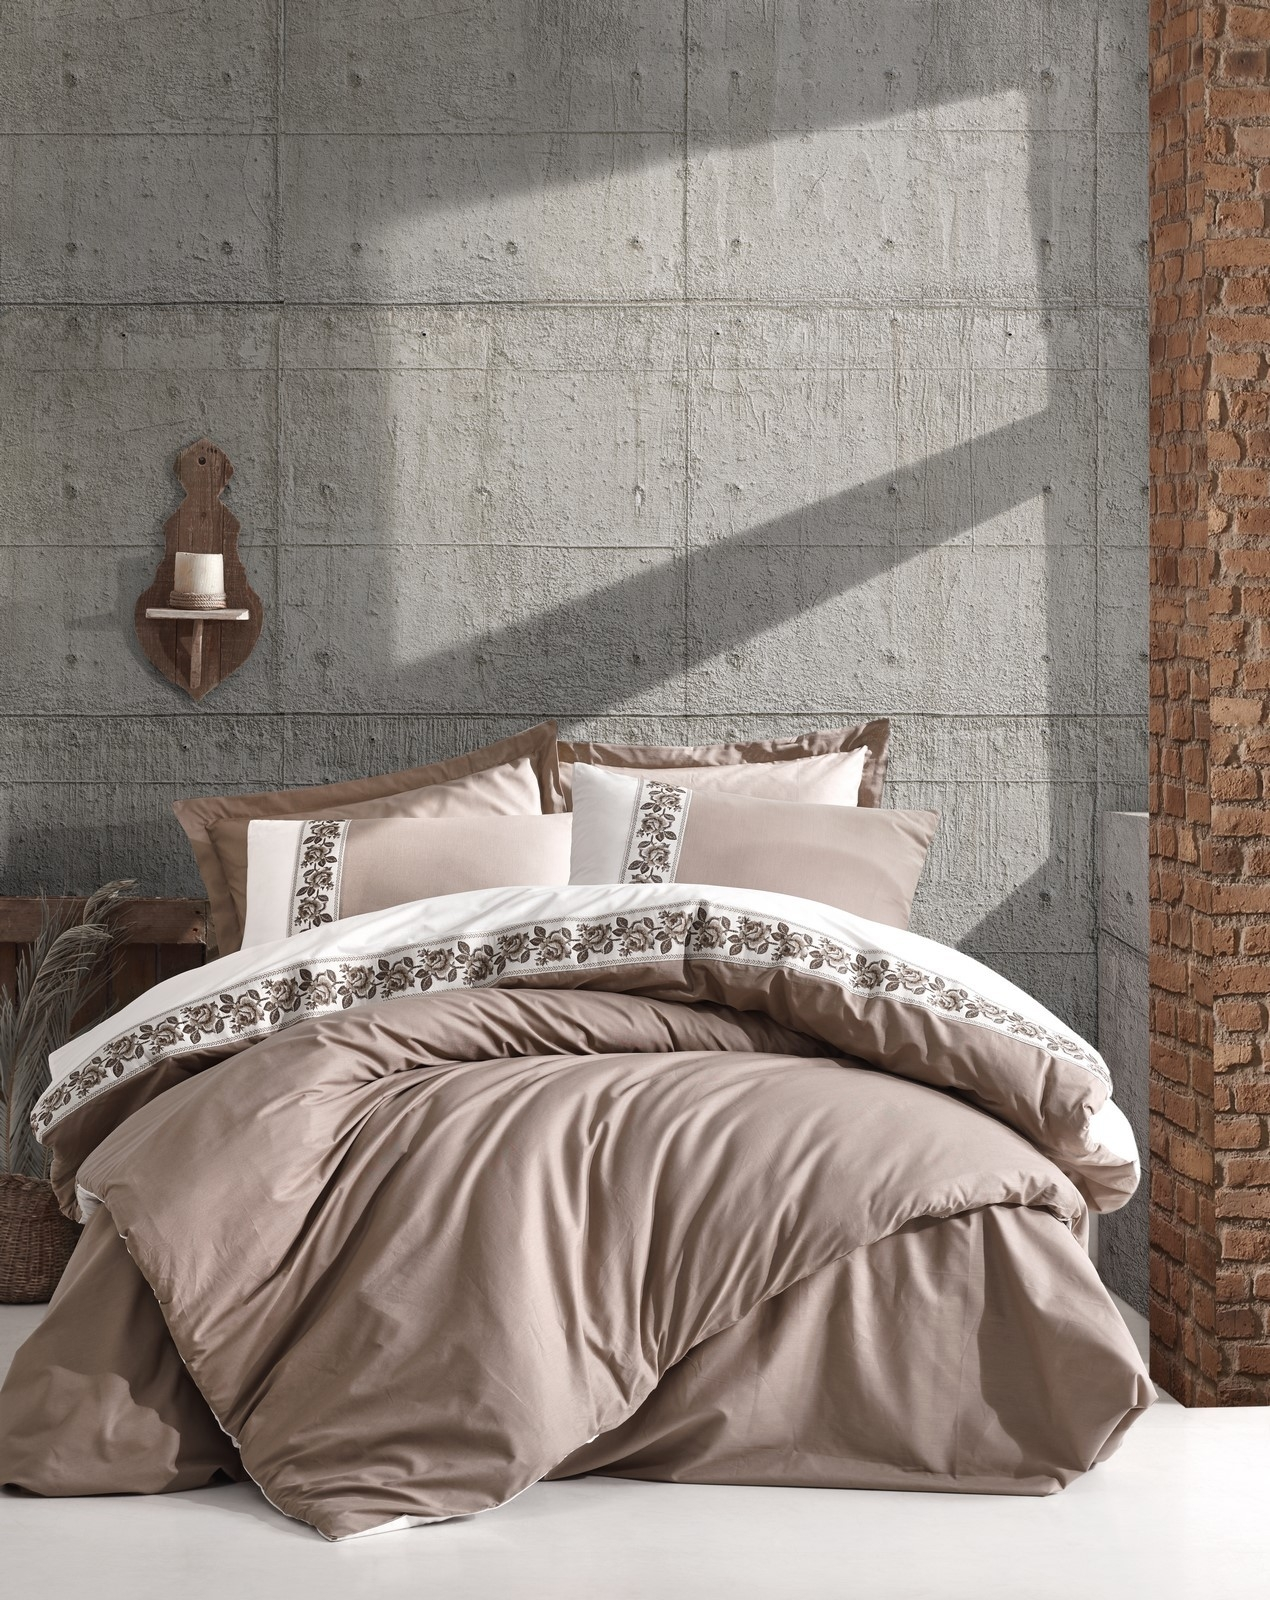 Lenjerie de pat din bumbac Ranforce, Rosinda Bej / Crem, 200 x 220 cm